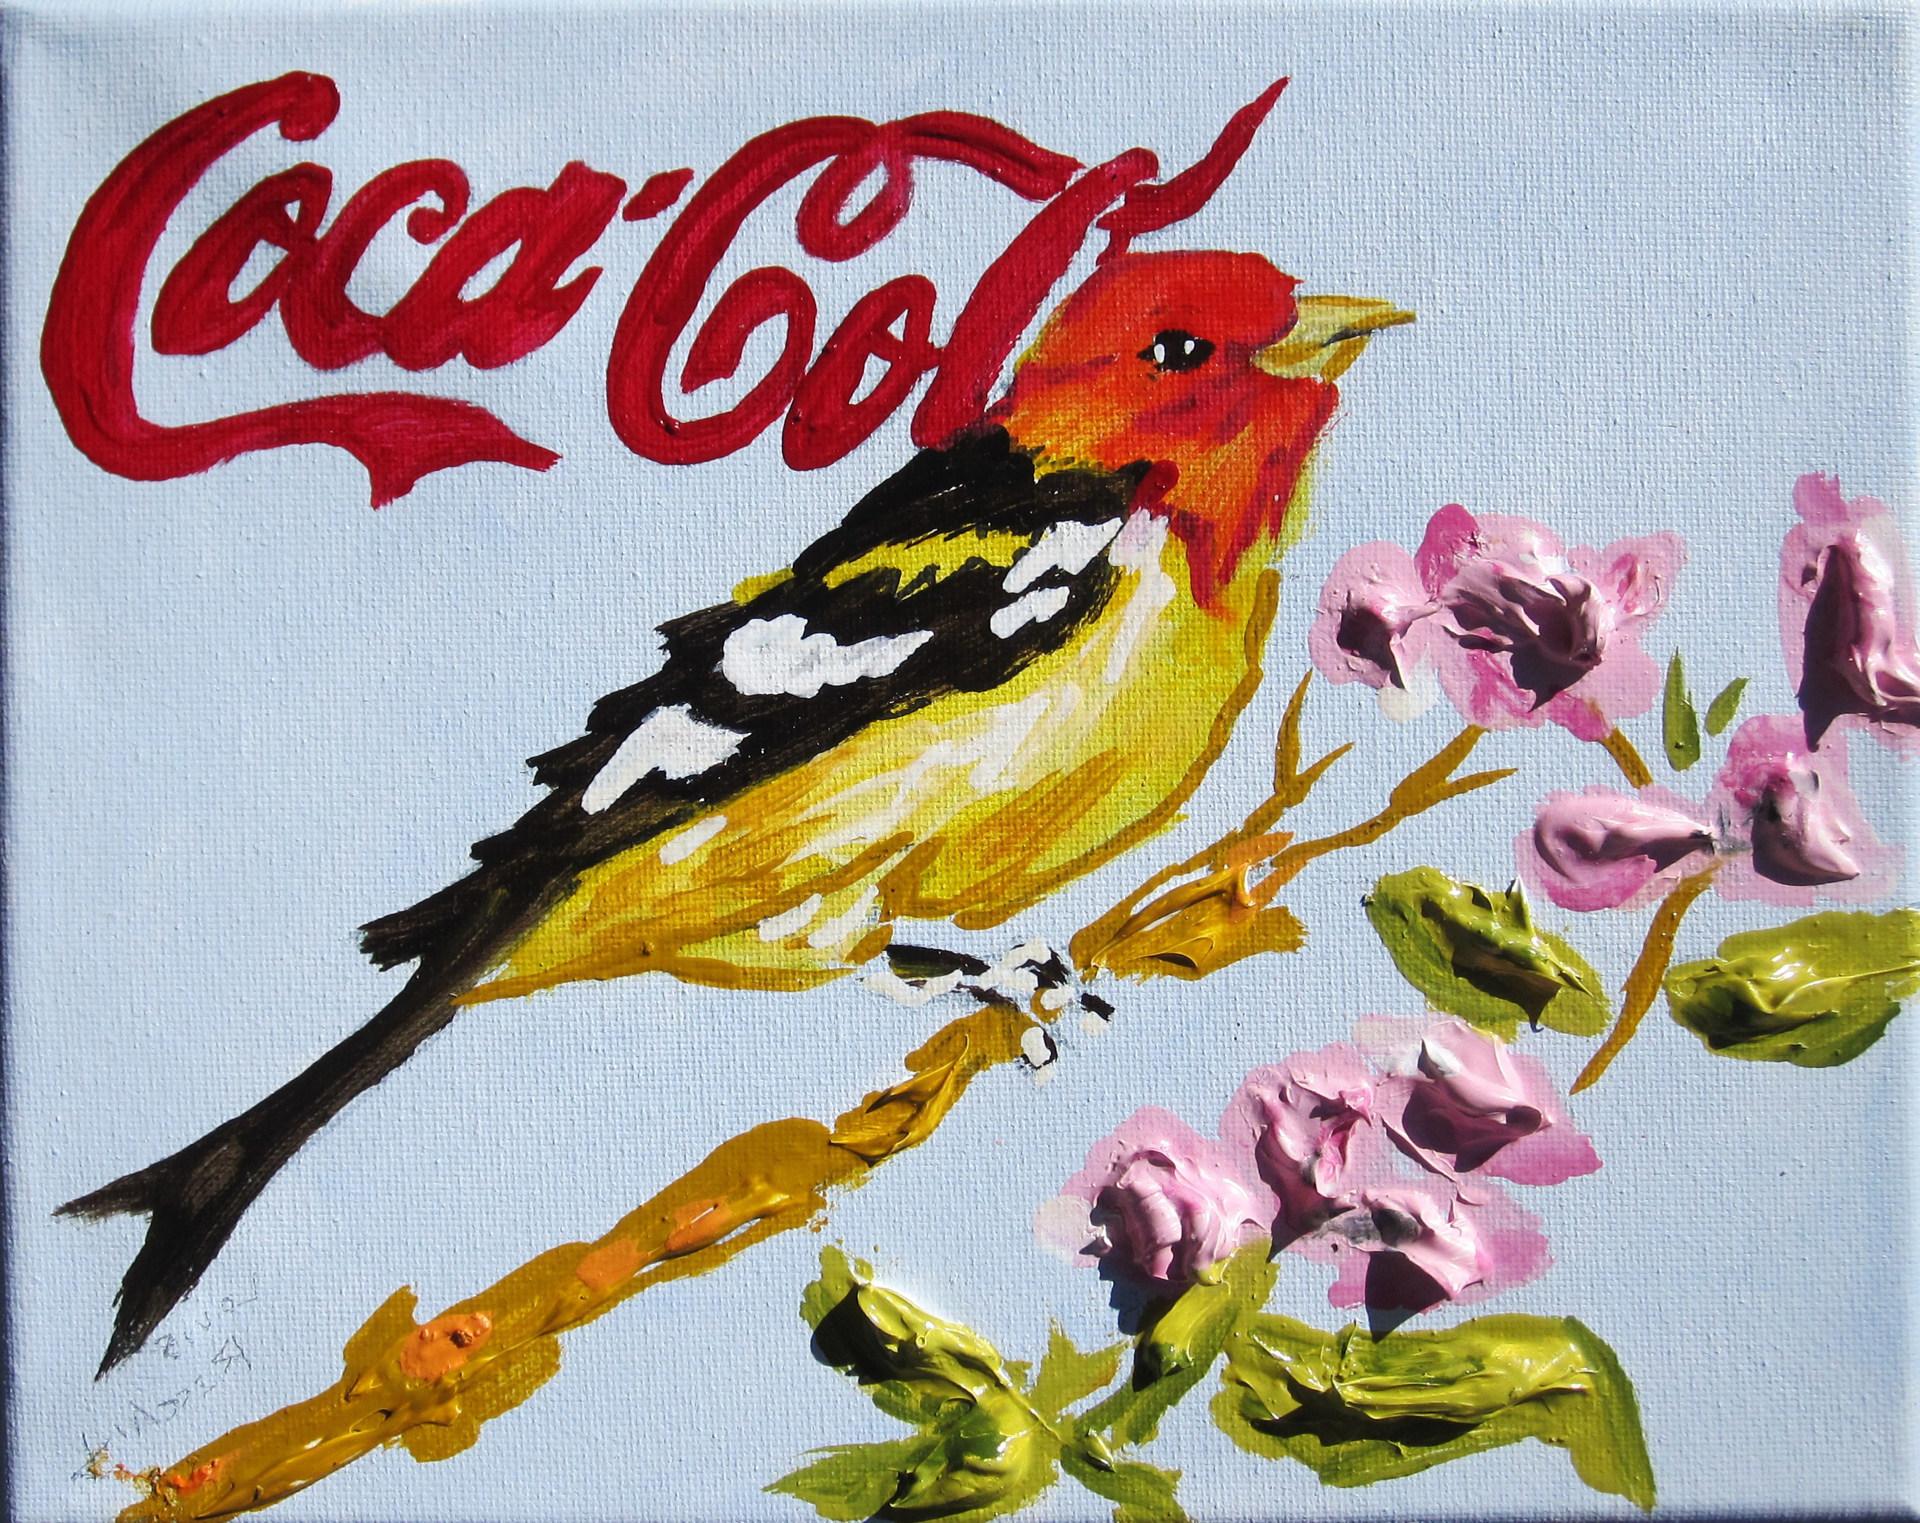 Songbird by Louis Recchia